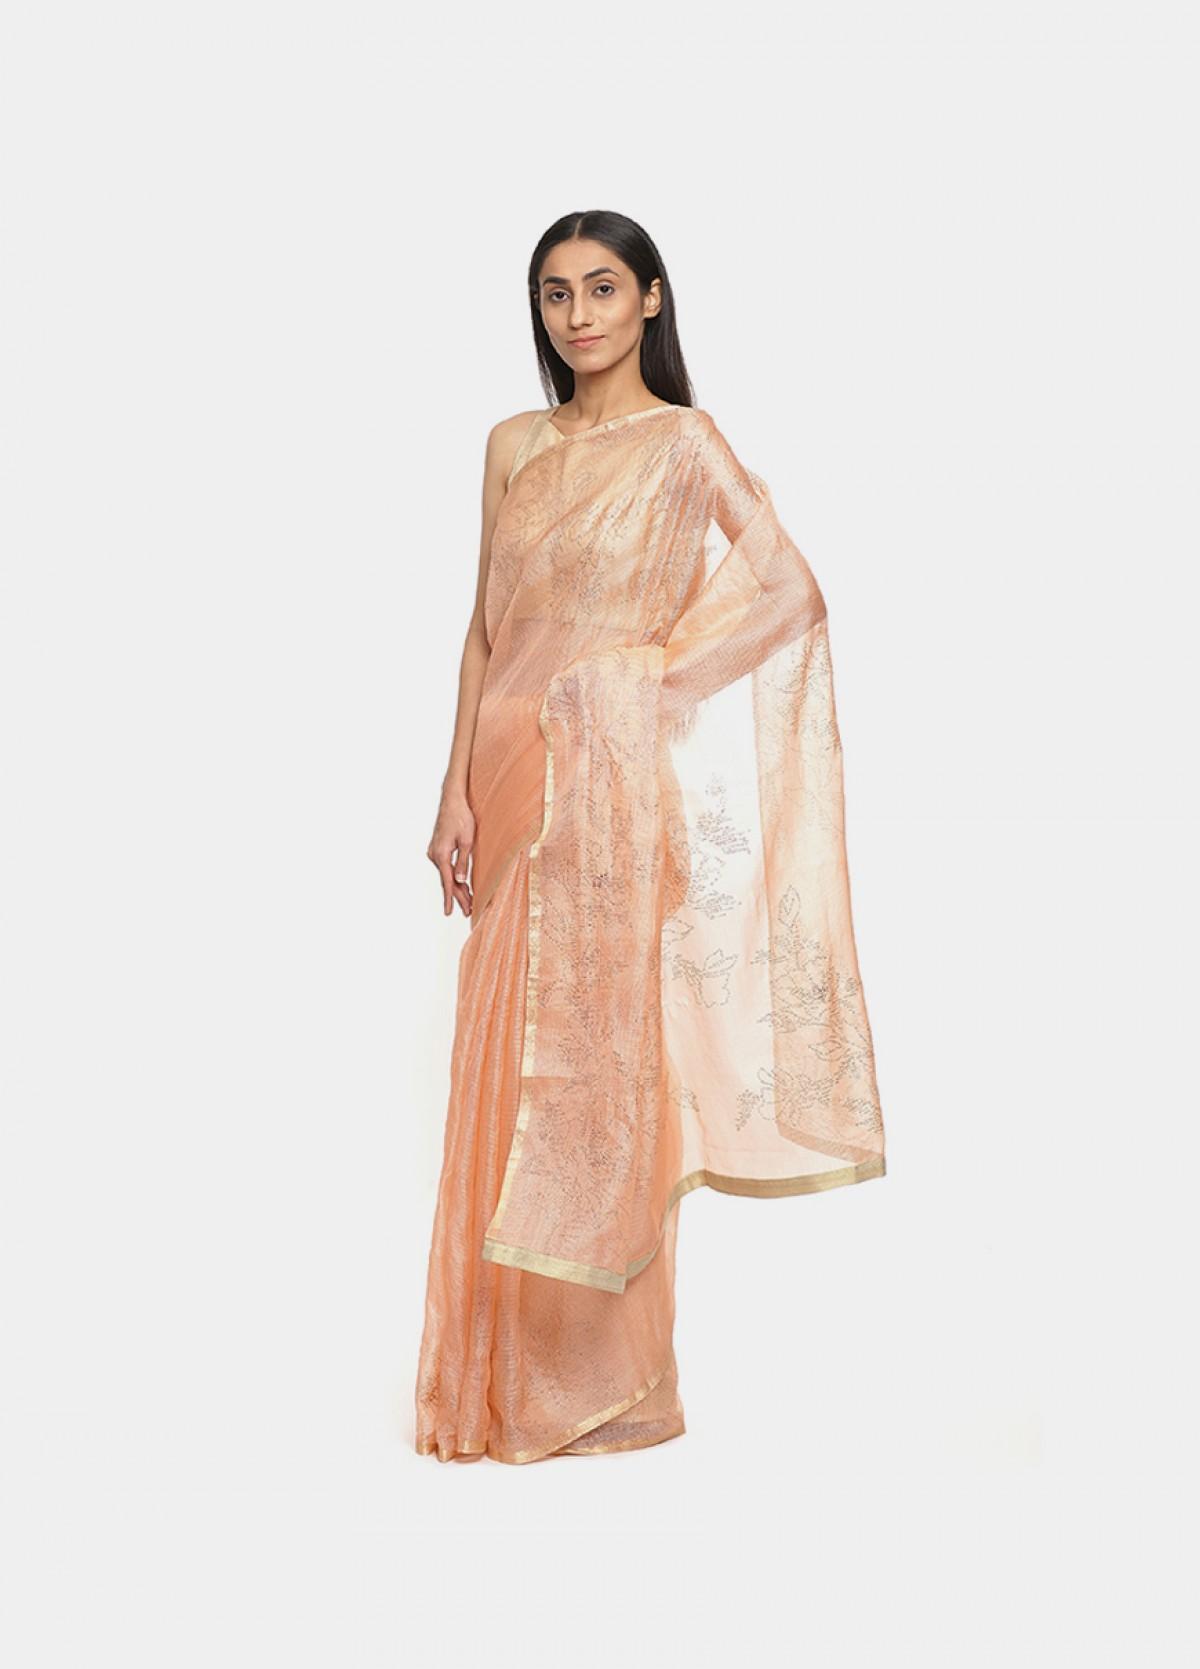 The Serenity Sari